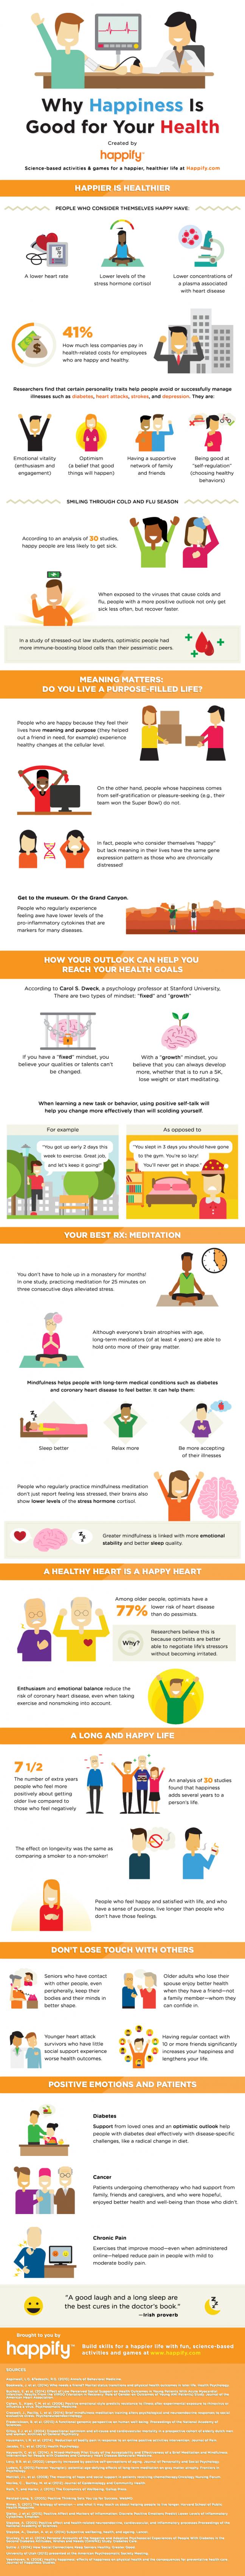 Infographic credit:Healthline.com